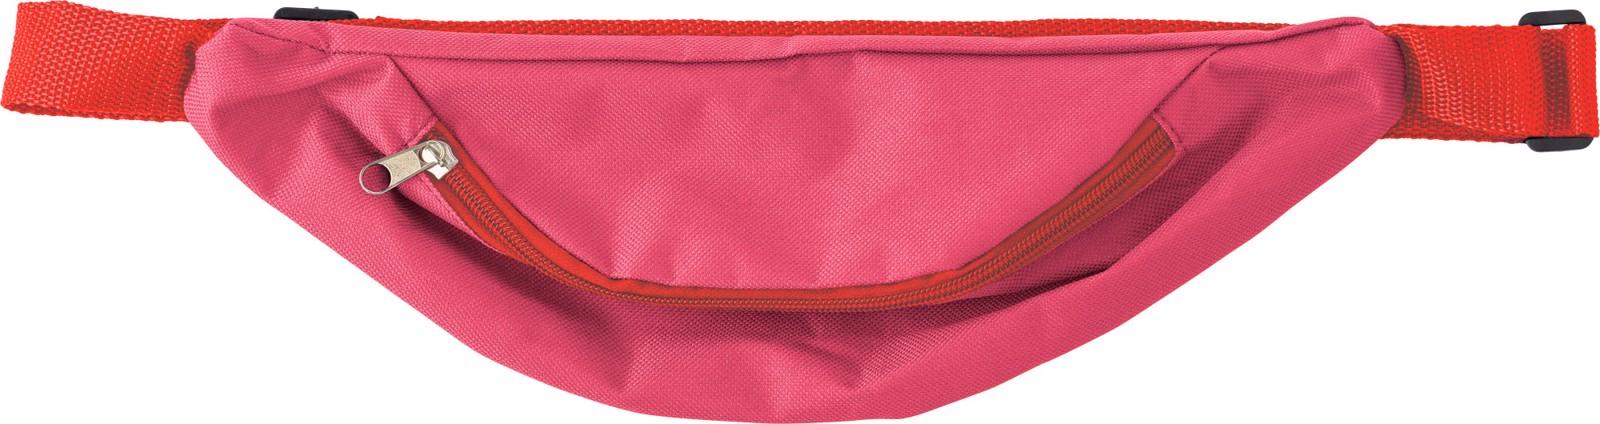 Oxford fabric waist bag - Red